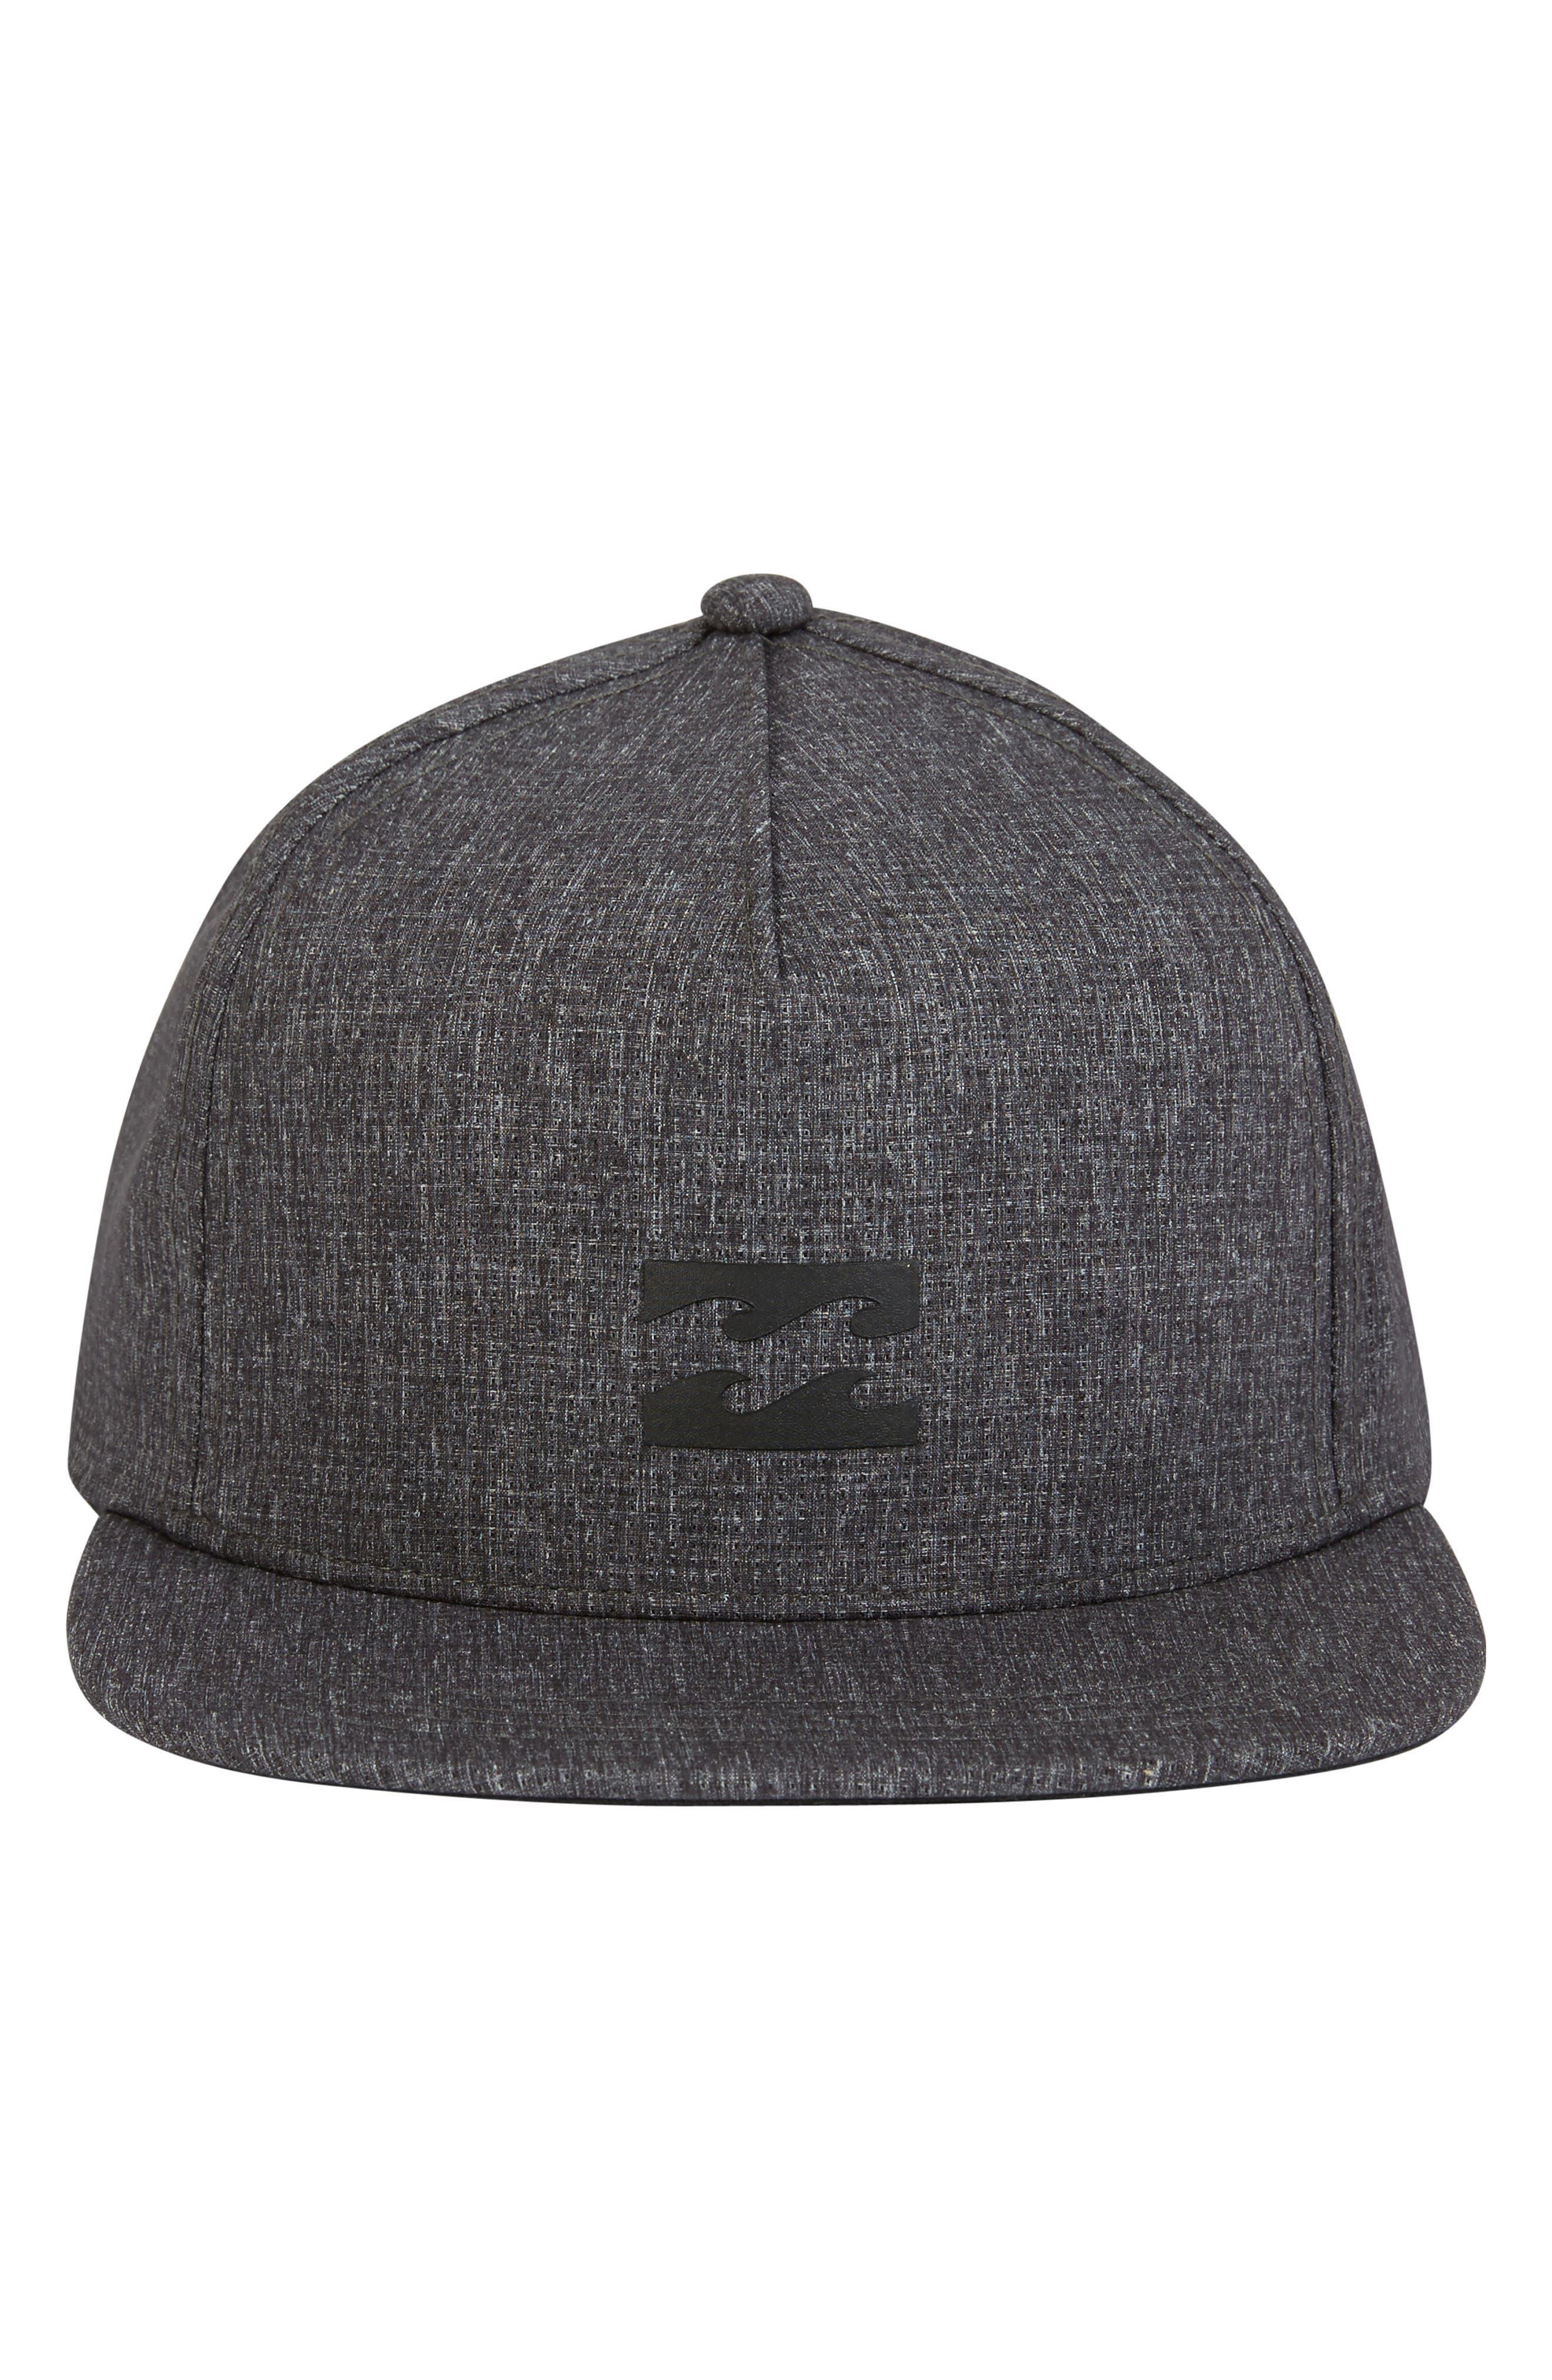 Surftrek Trucker Hat,                             Alternate thumbnail 2, color,                             BLACK HEATHER